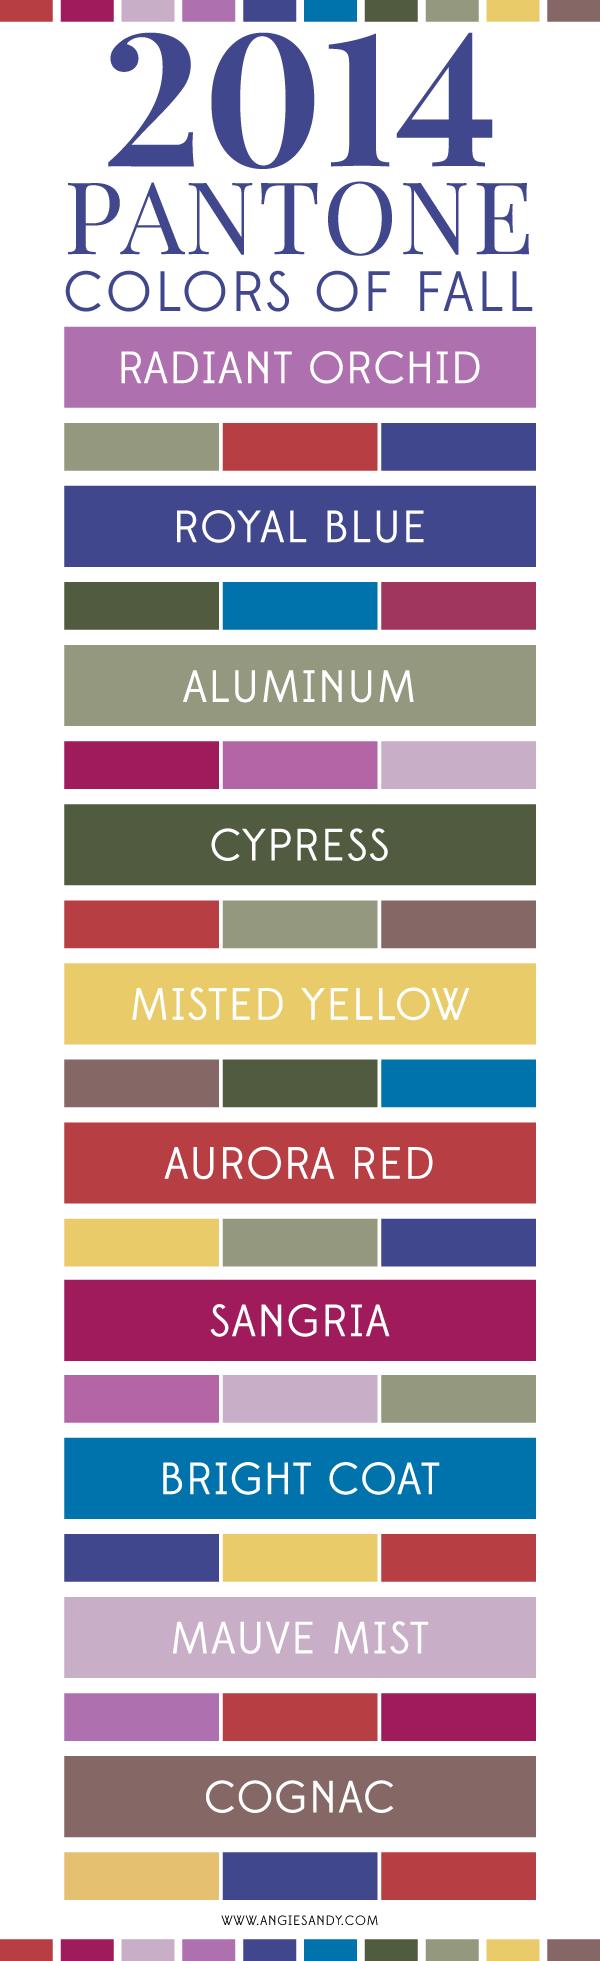 Pantone Colors of Fall 2014 #angiesandy #pantone #colorpalette